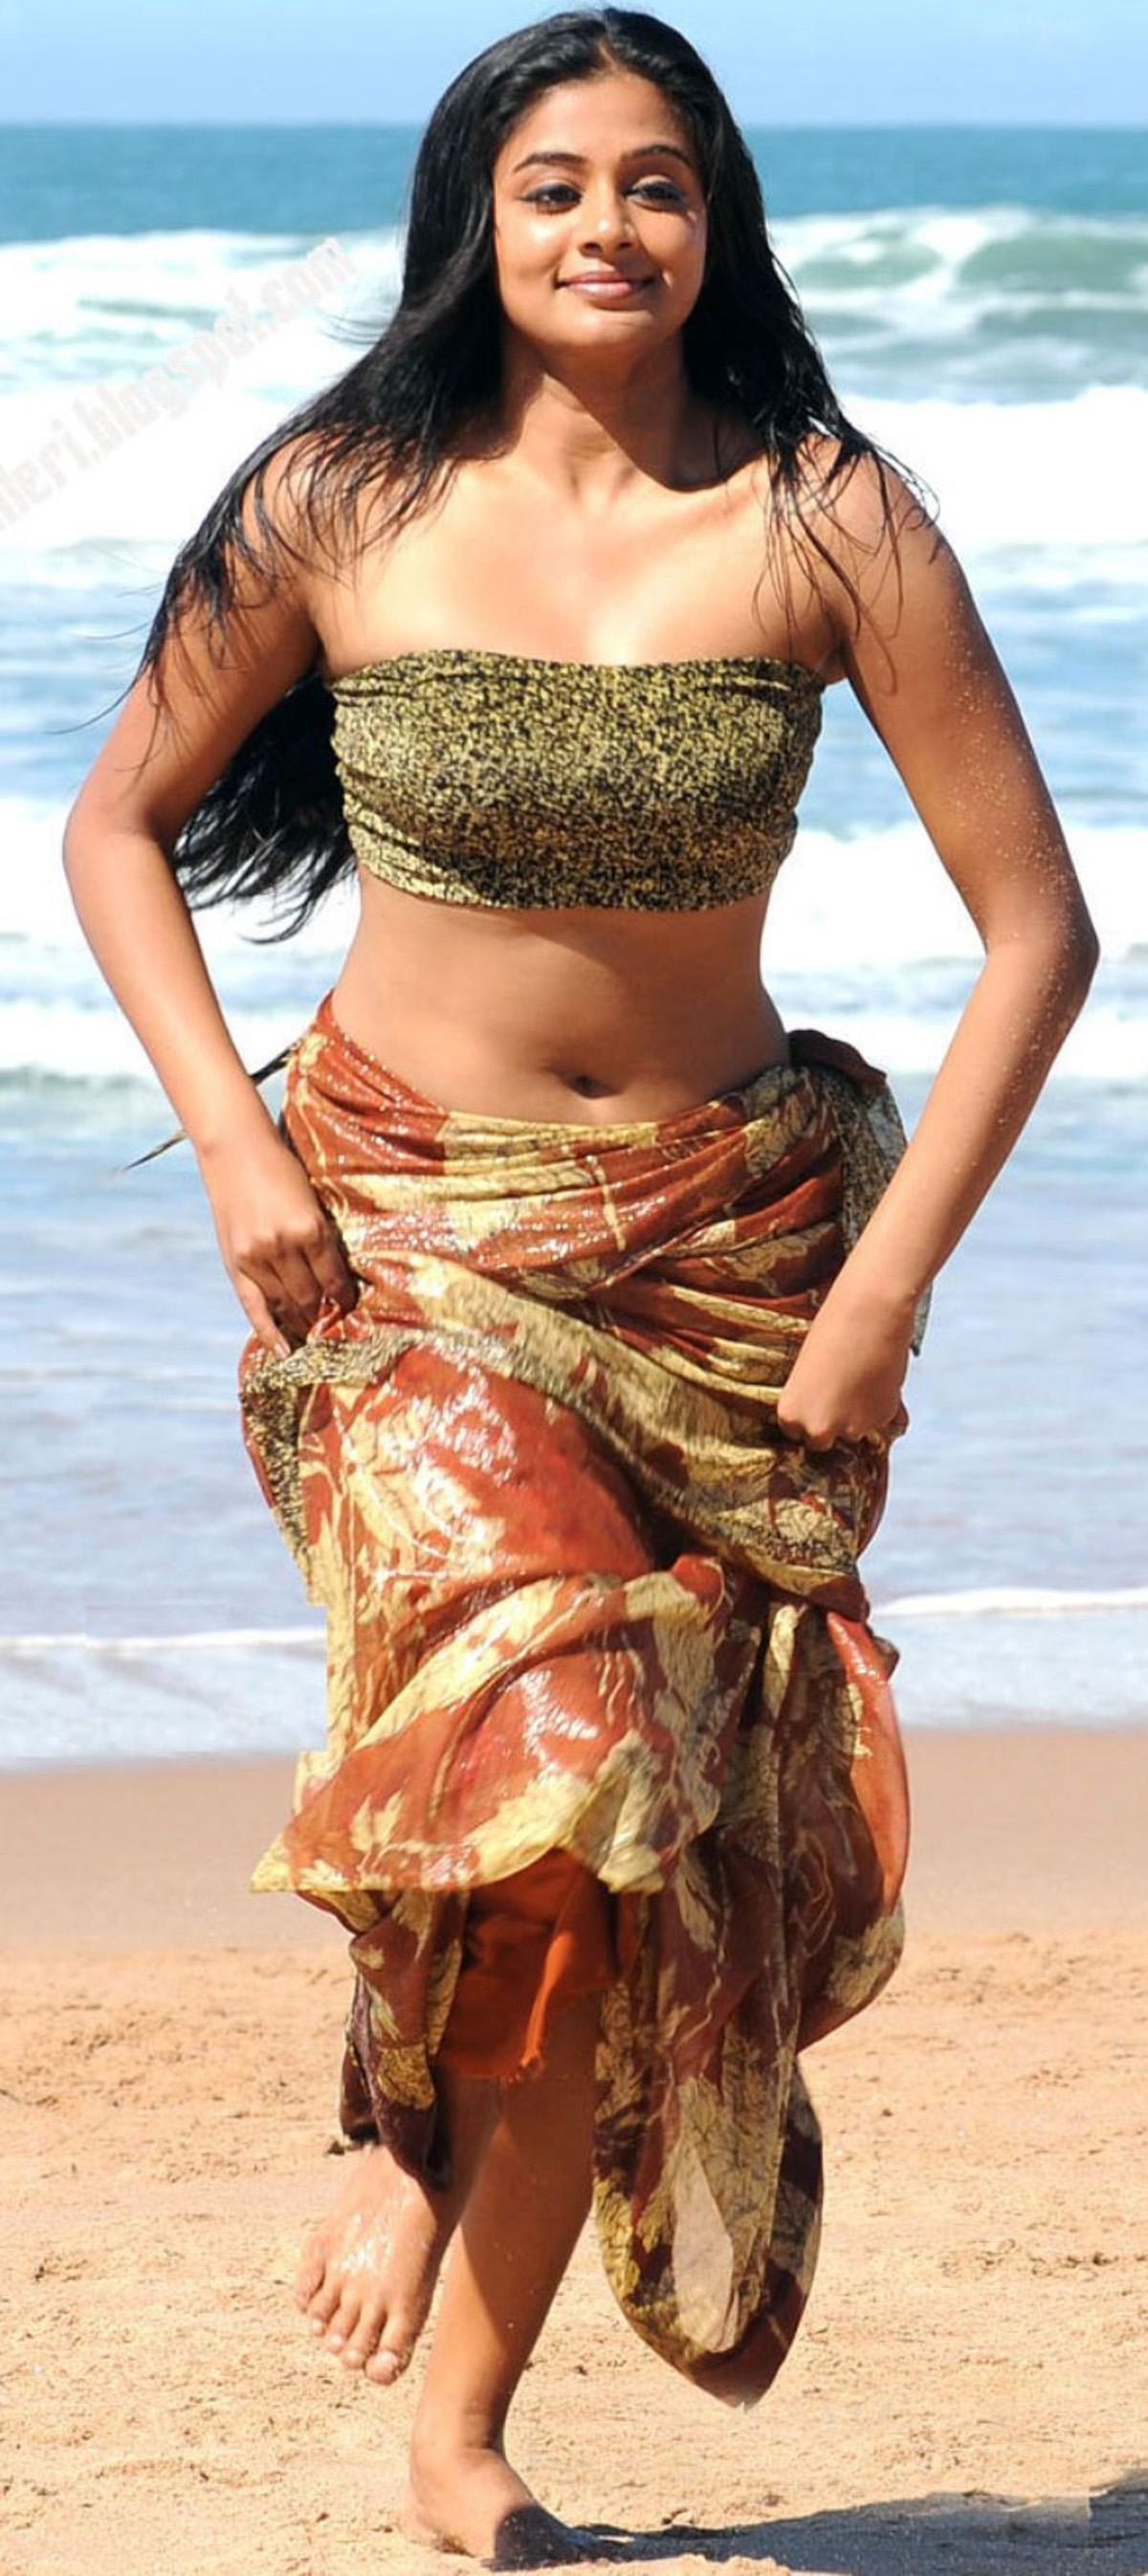 Priyamani latest hot stills priyamani latest hot photos images pics - Telugu Actress Priyamani Hot Pic 8 Jpg 1200